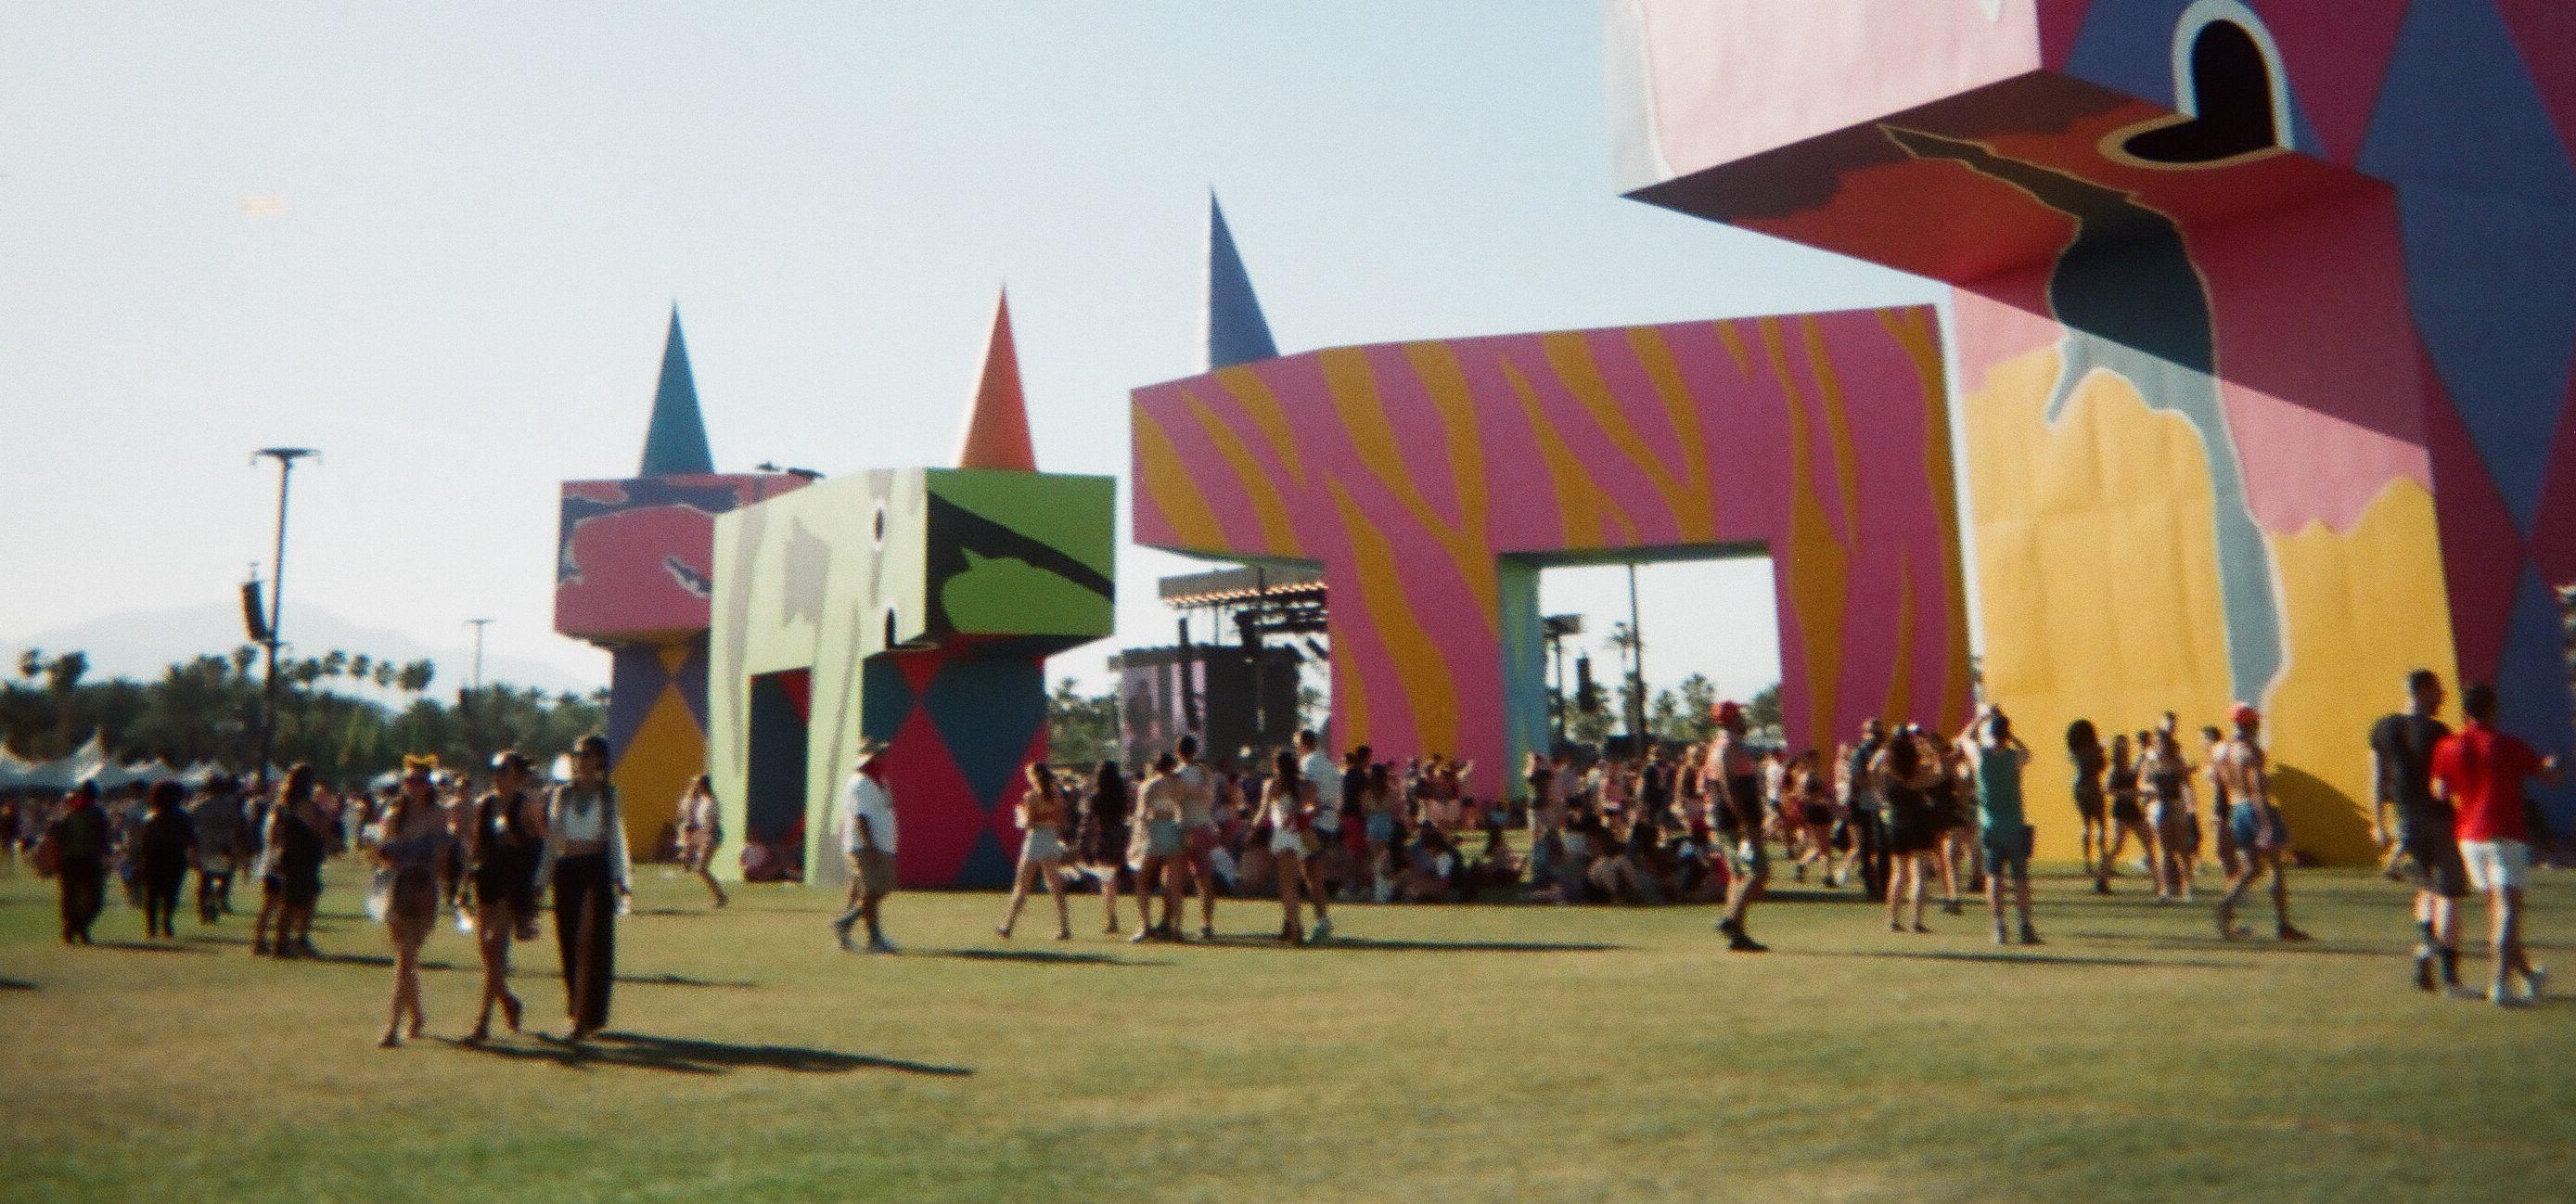 Coachella Weekend 1 on 35mm Film via @sacramentopress